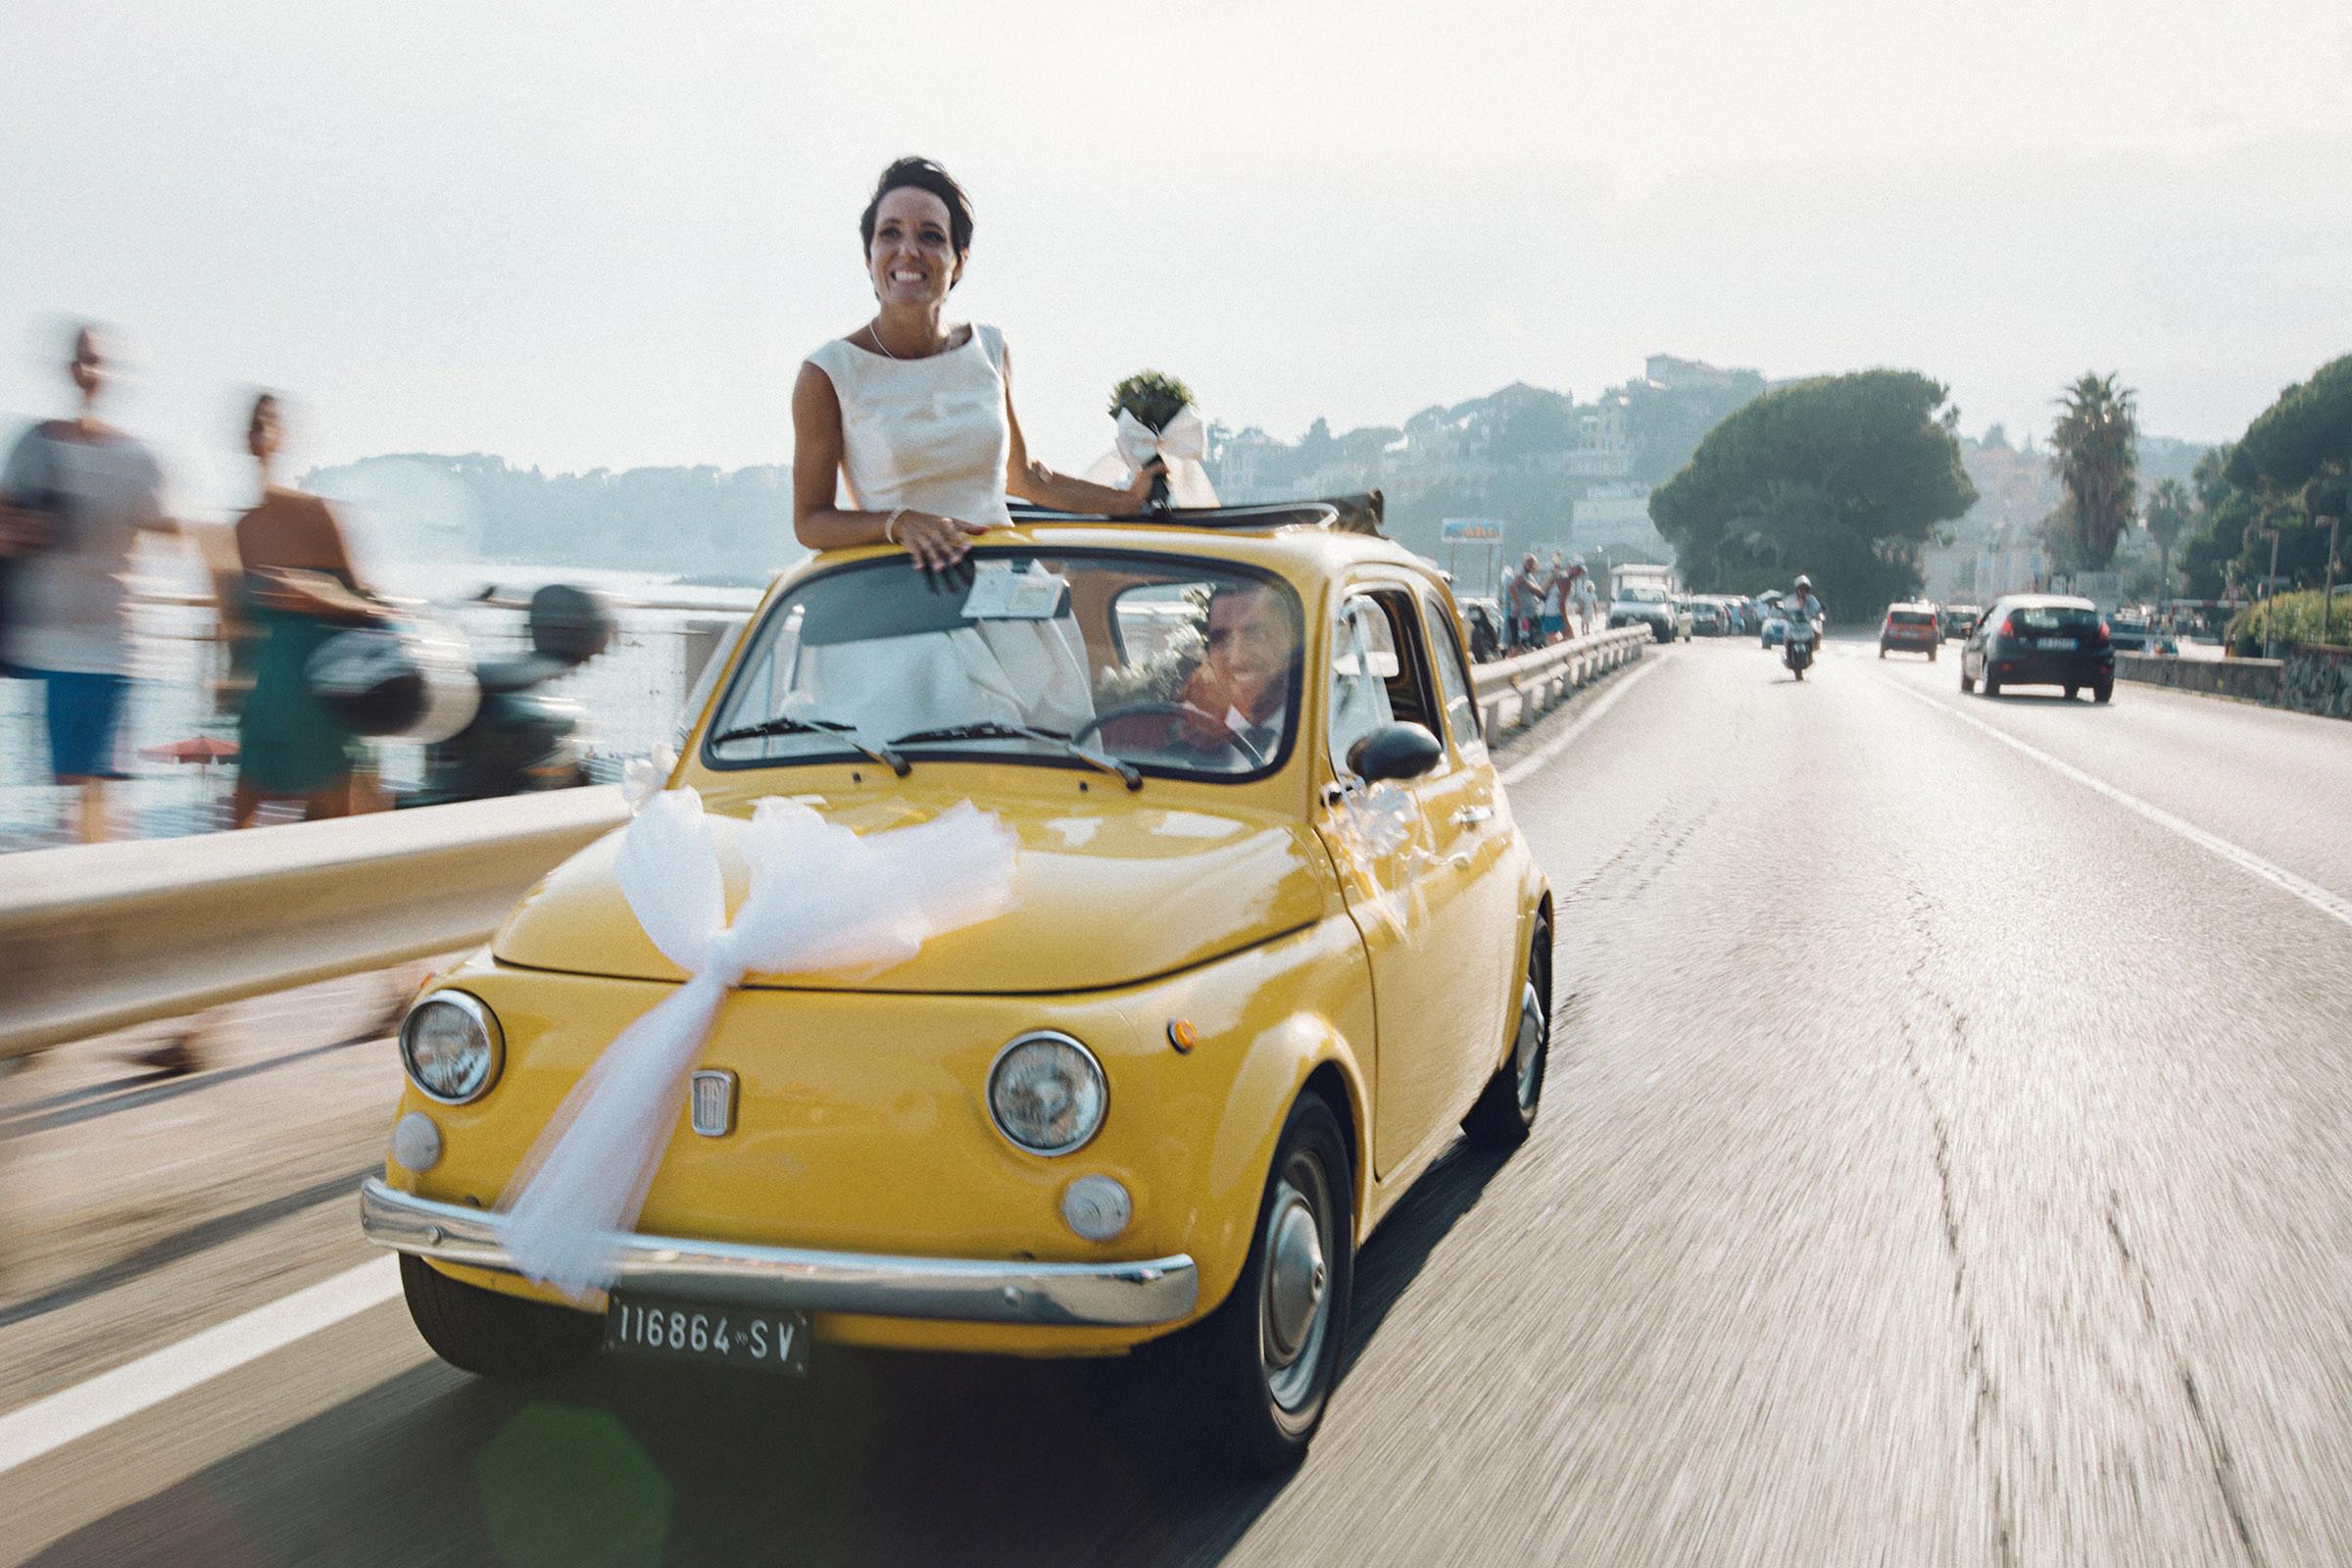 bride-standing-in-little-yellow-car-as-couple-drives-over-scenic-bridge-andrea-bagnasco-fotografie